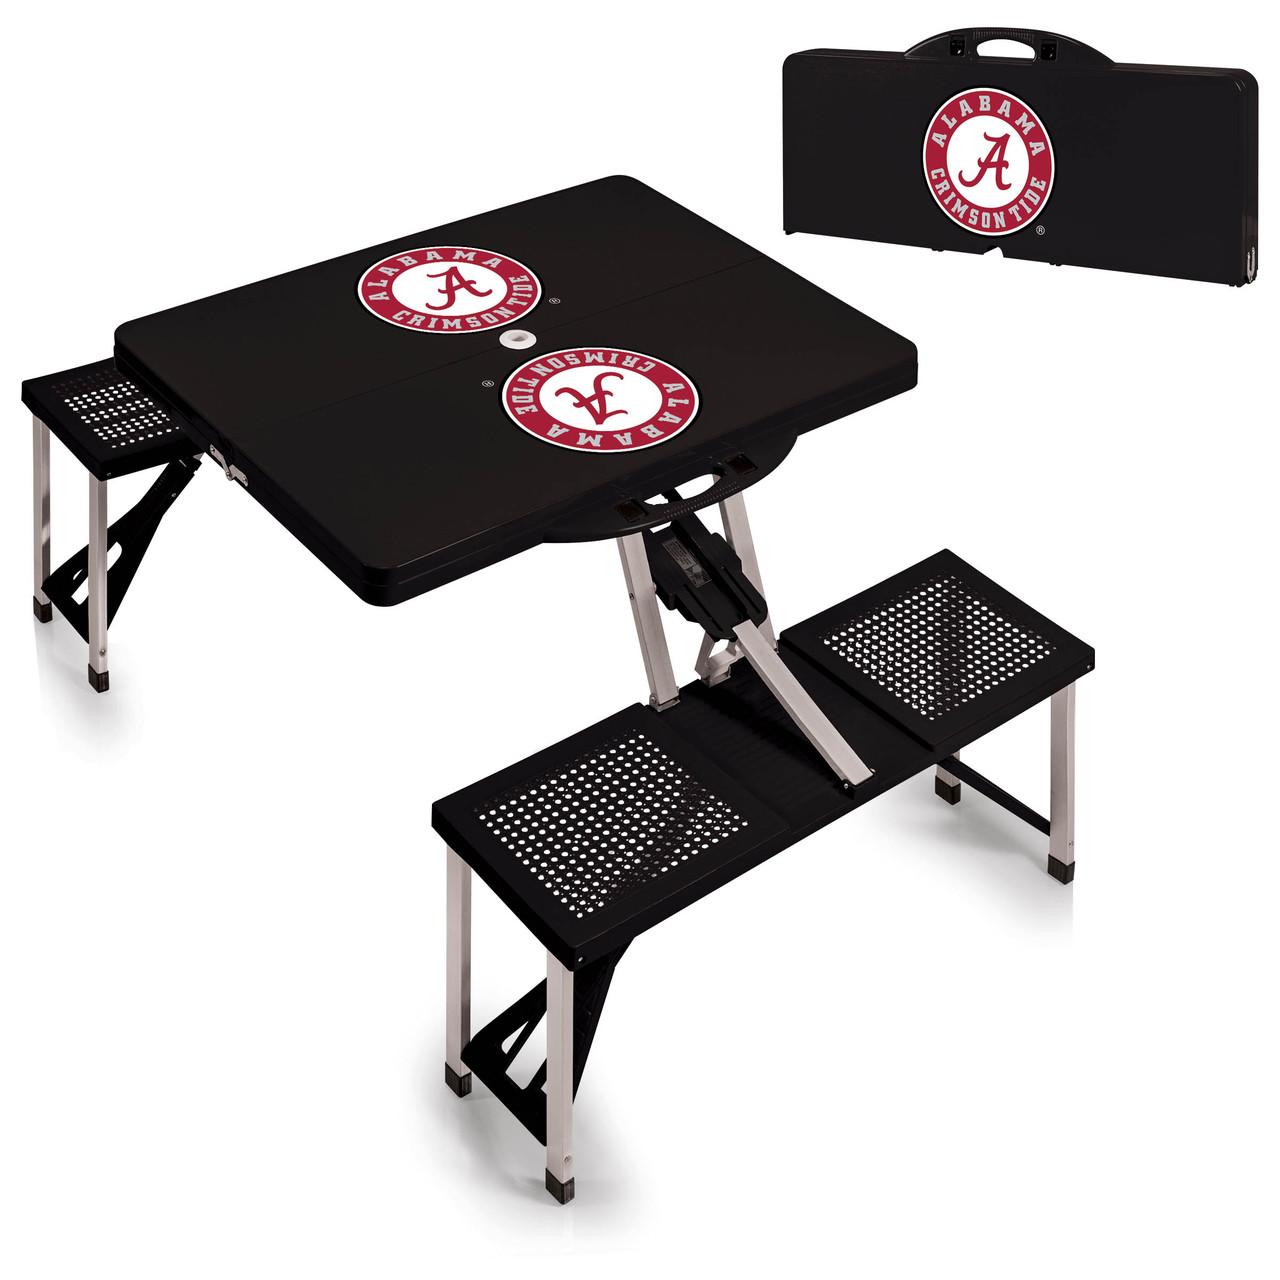 Picnic Table - University of Alabama